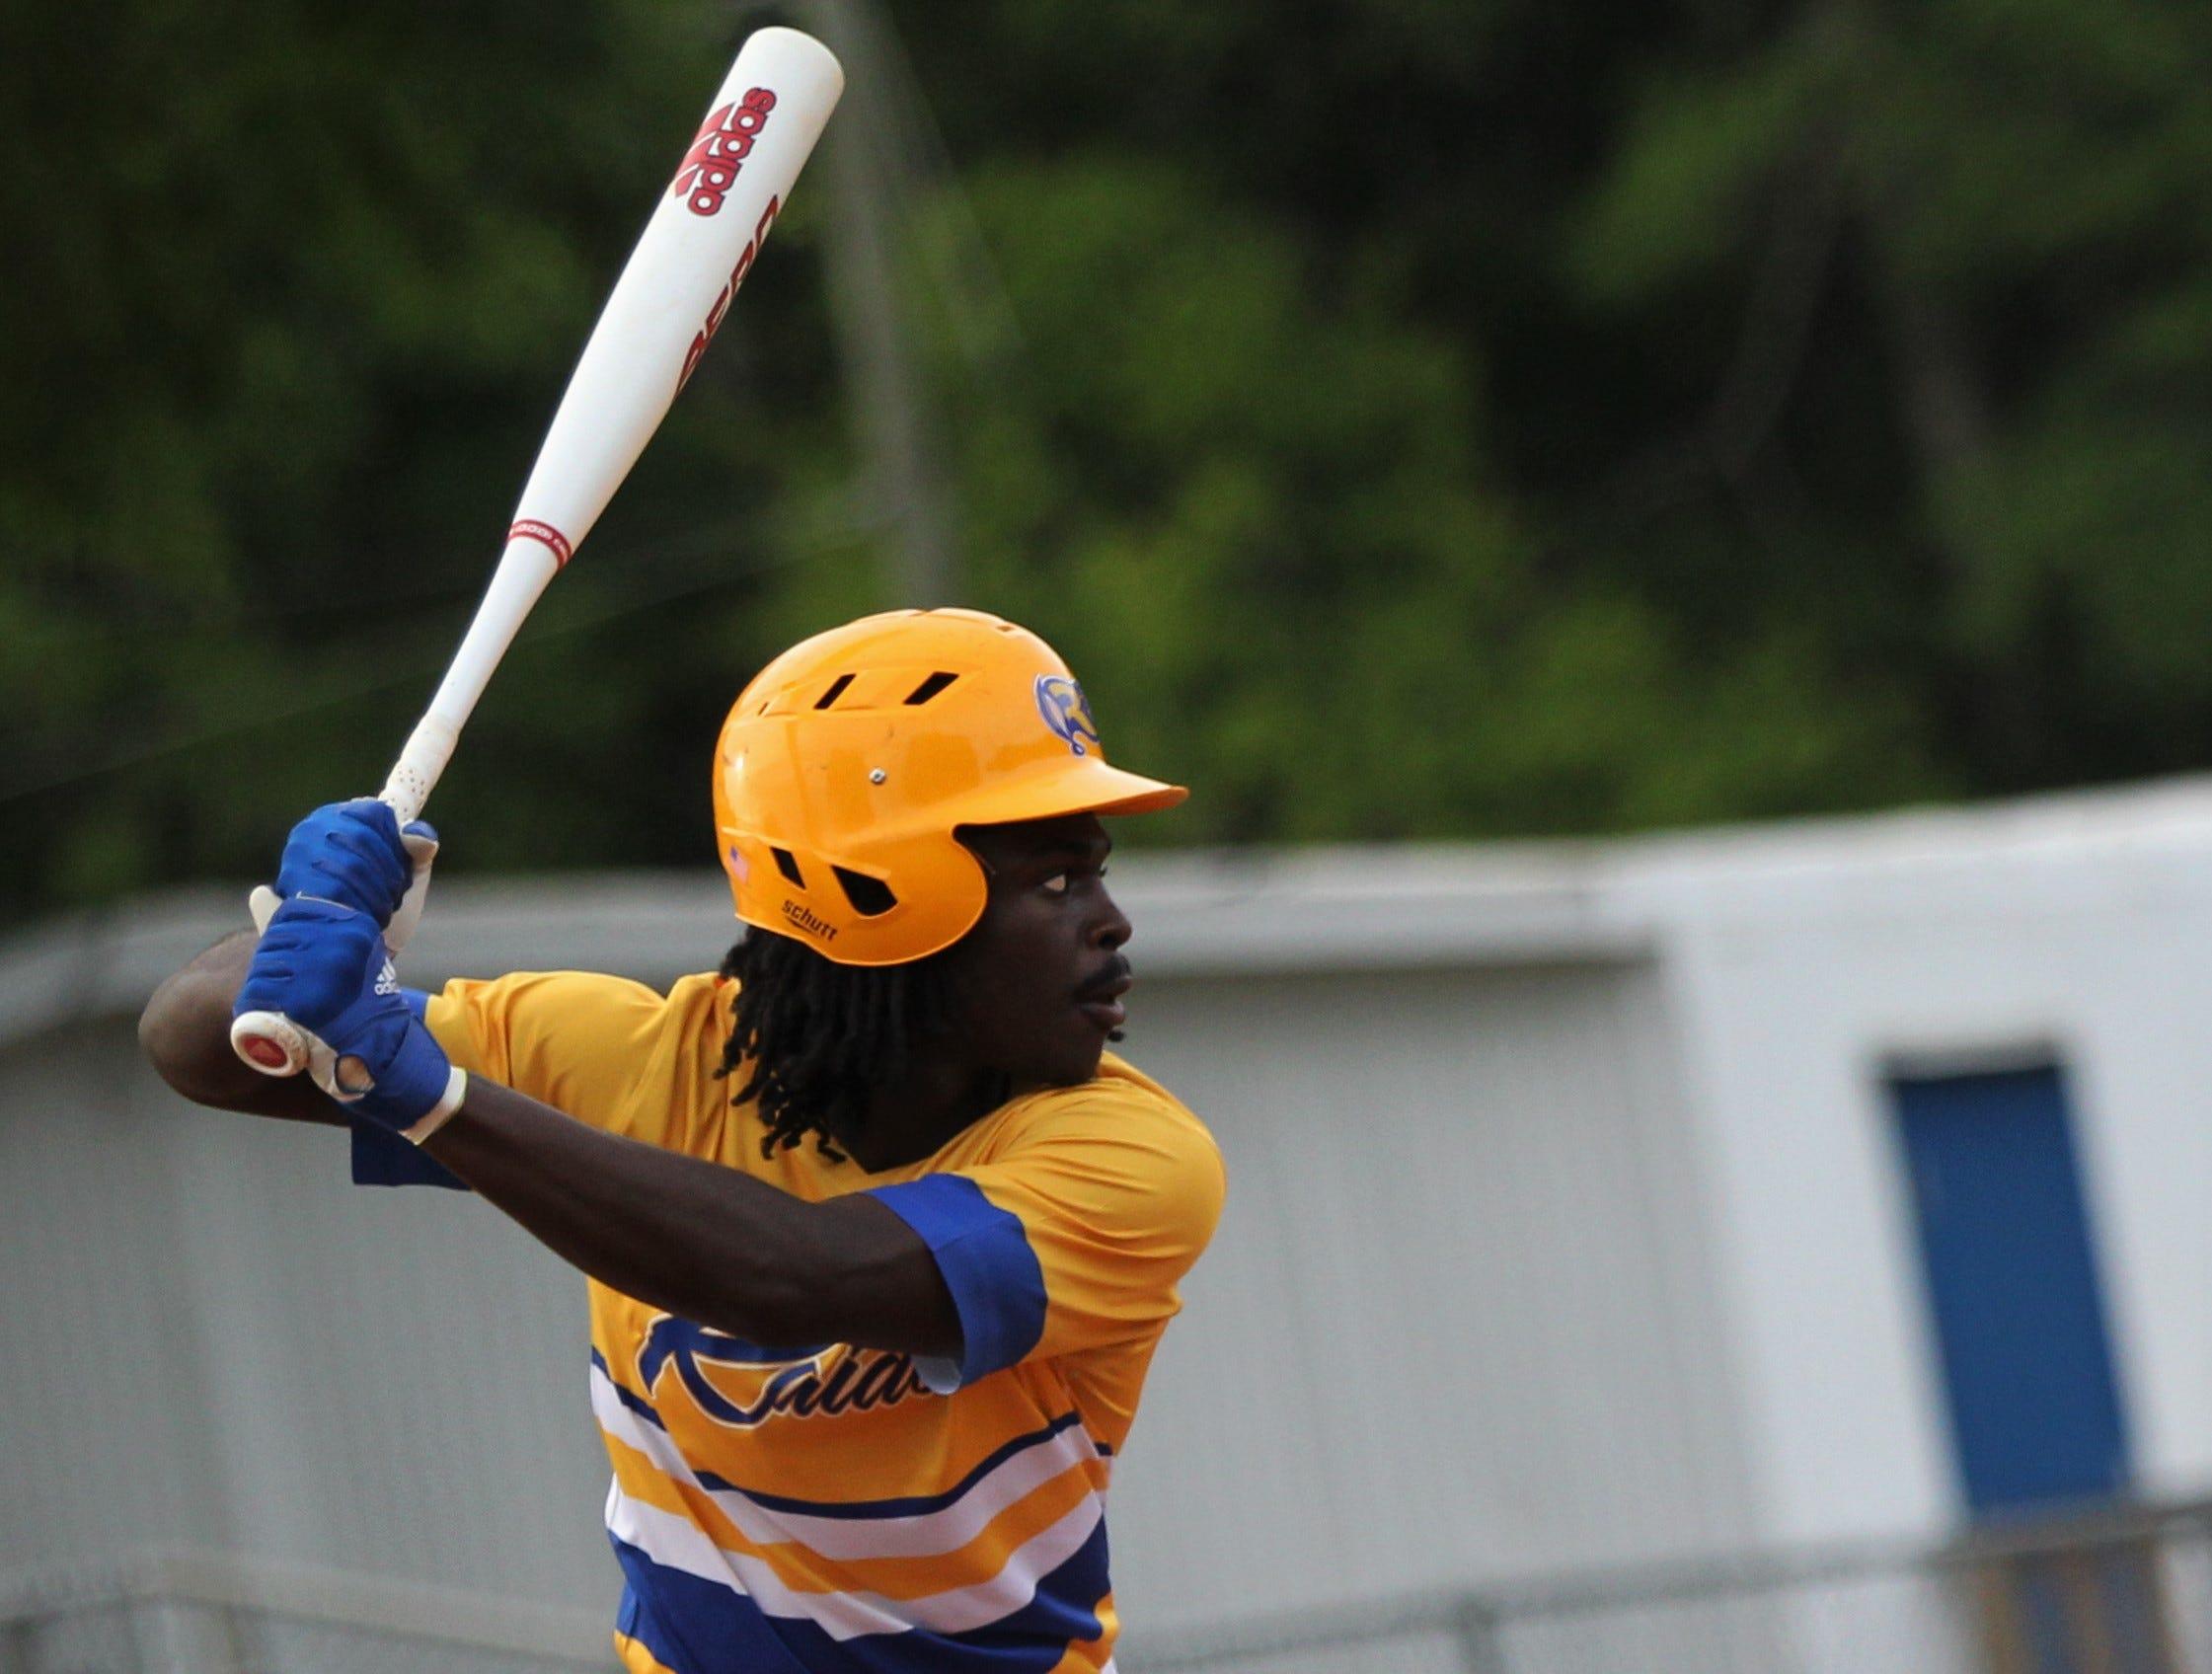 Rickards sophomore Kaleb Henry bats as Rickards beat Gadsden County 18-0 in three innings on Friday, April 12, 2019.